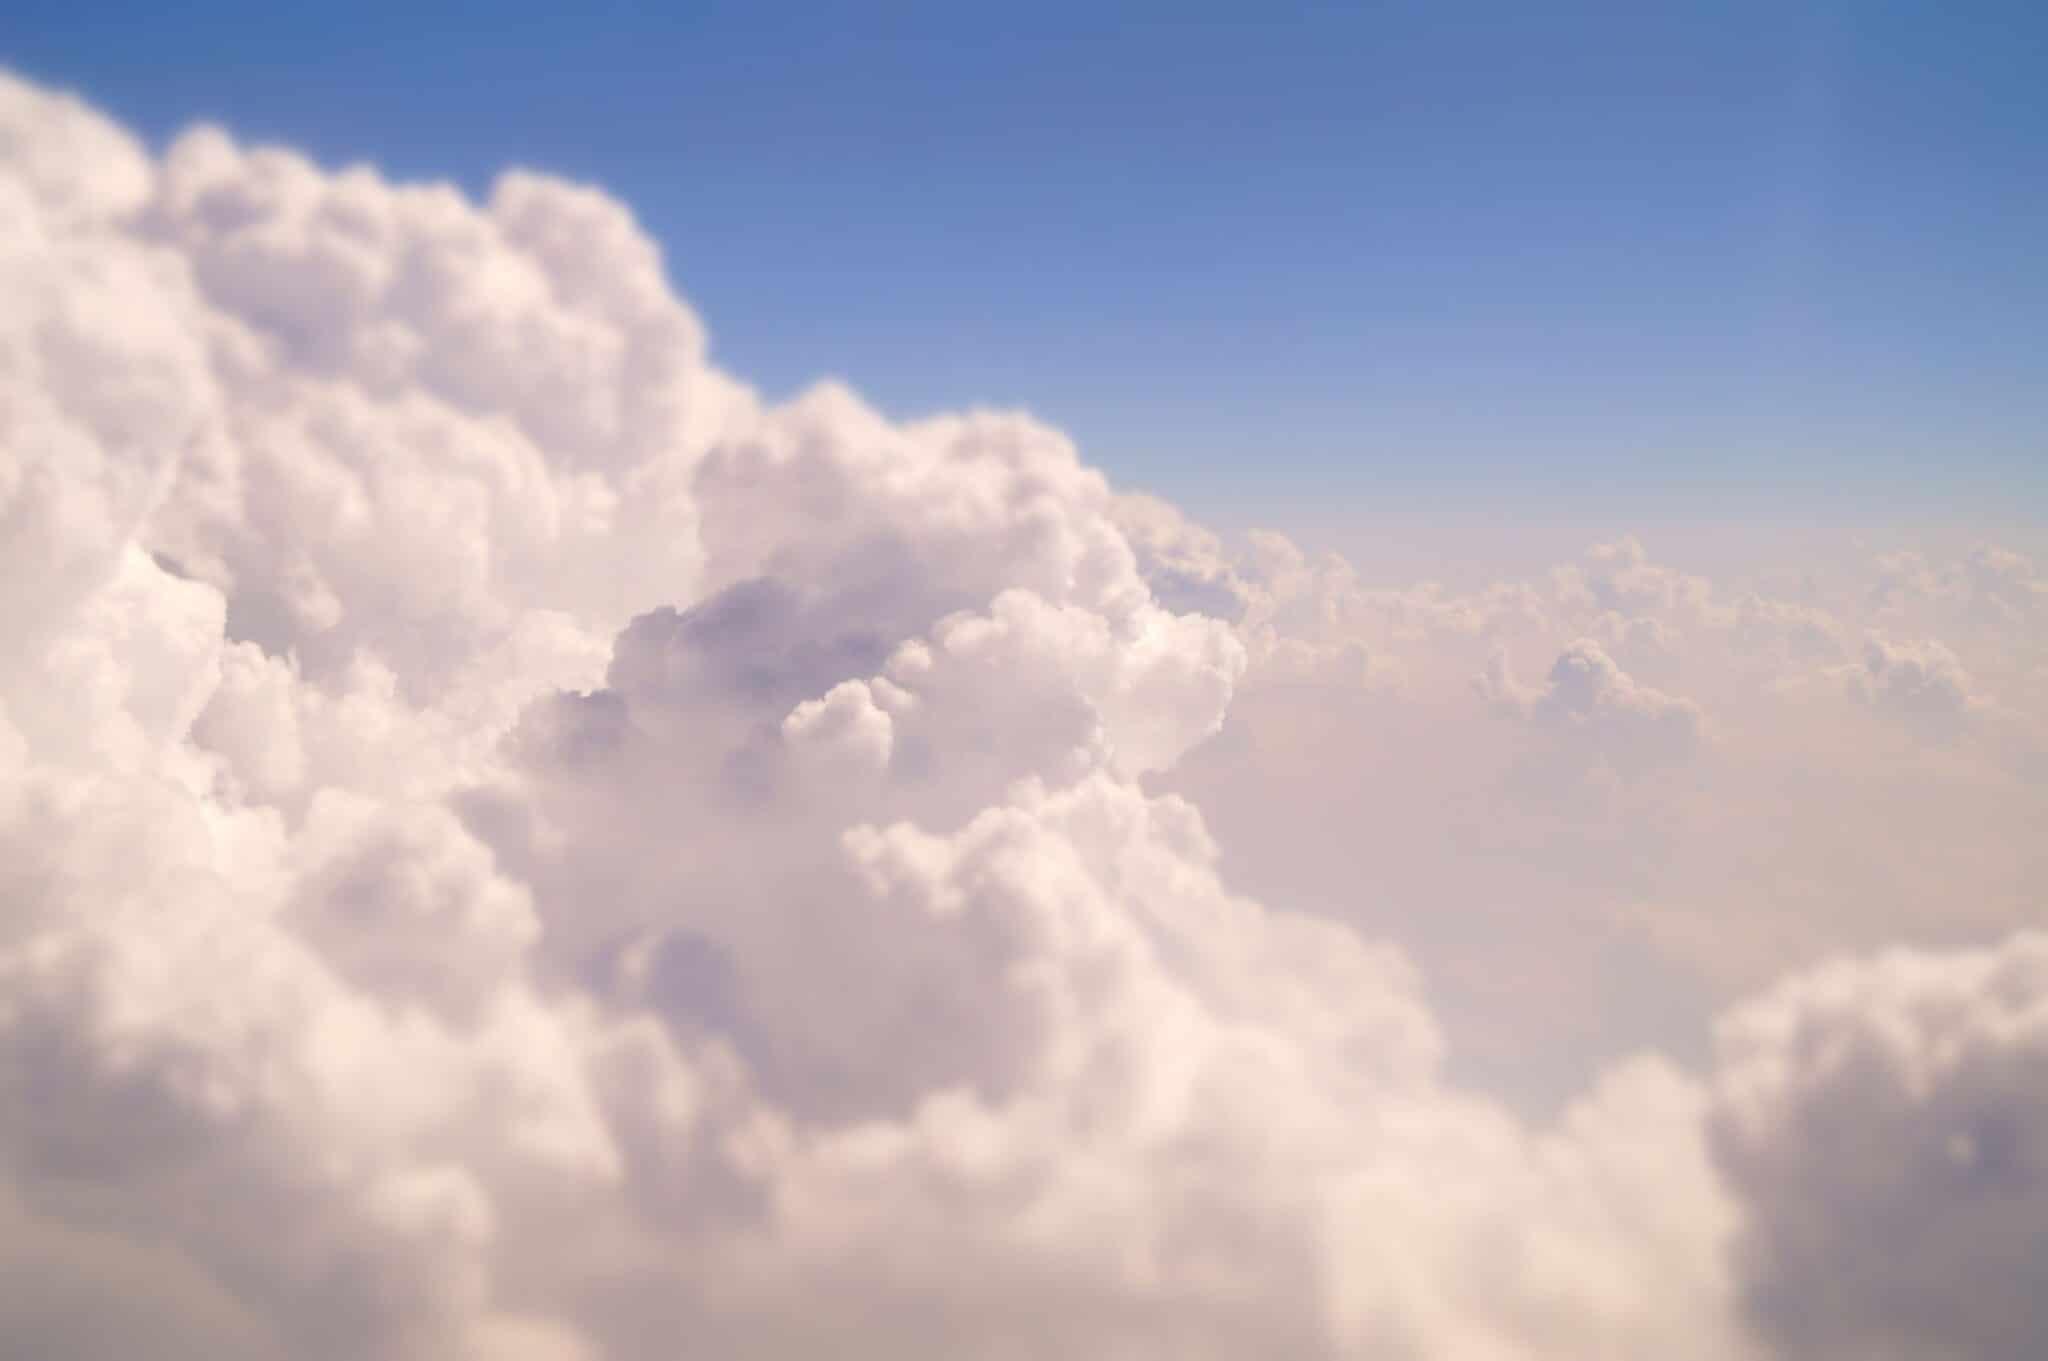 clouds android wallpaper fond ecran - DroidSoft